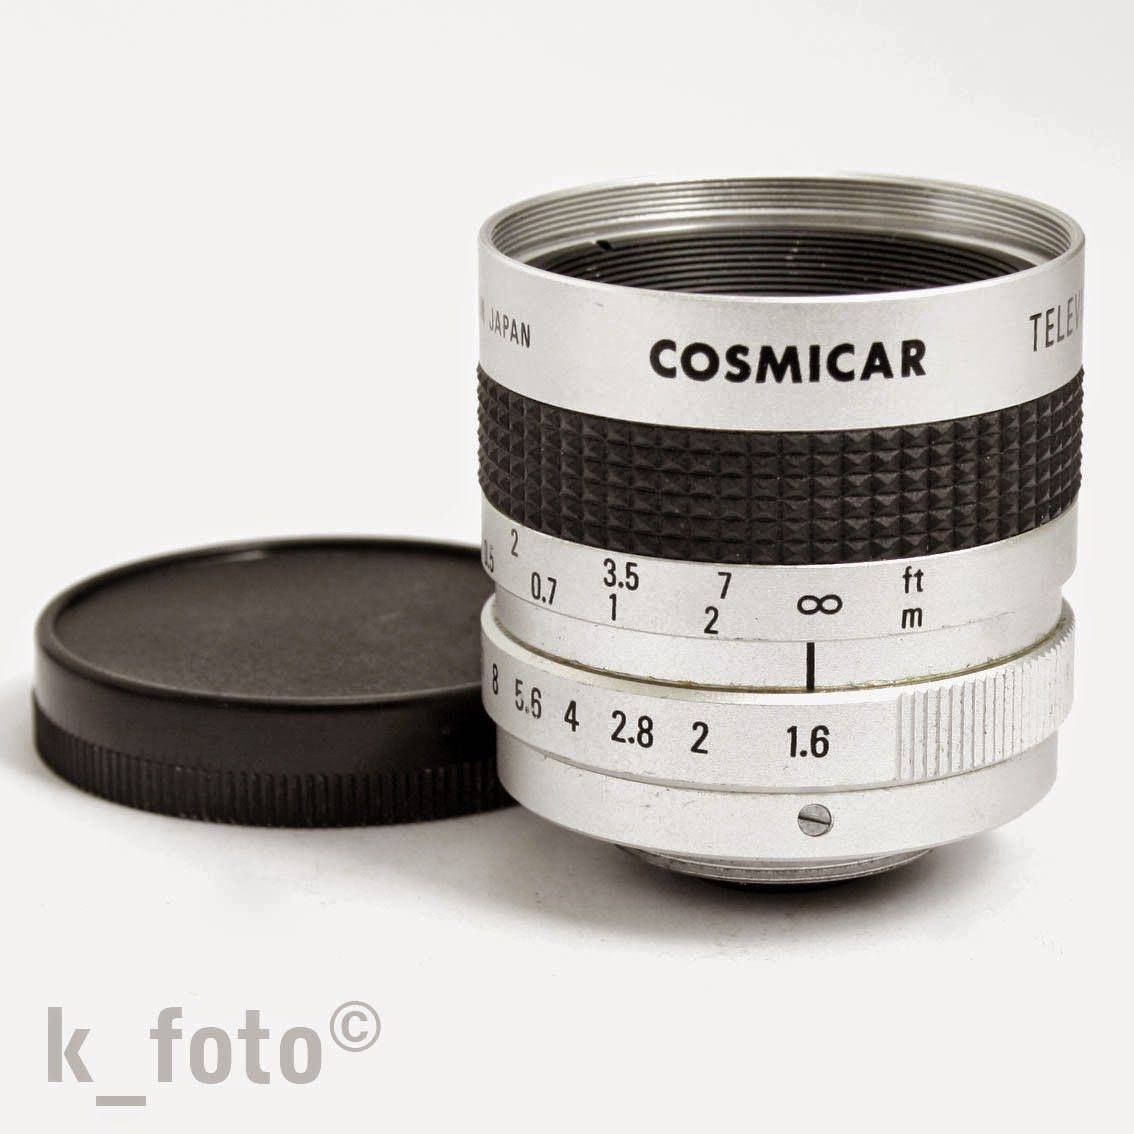 c-mount: Cosmicar Television Lens 1,6 / 16 mm